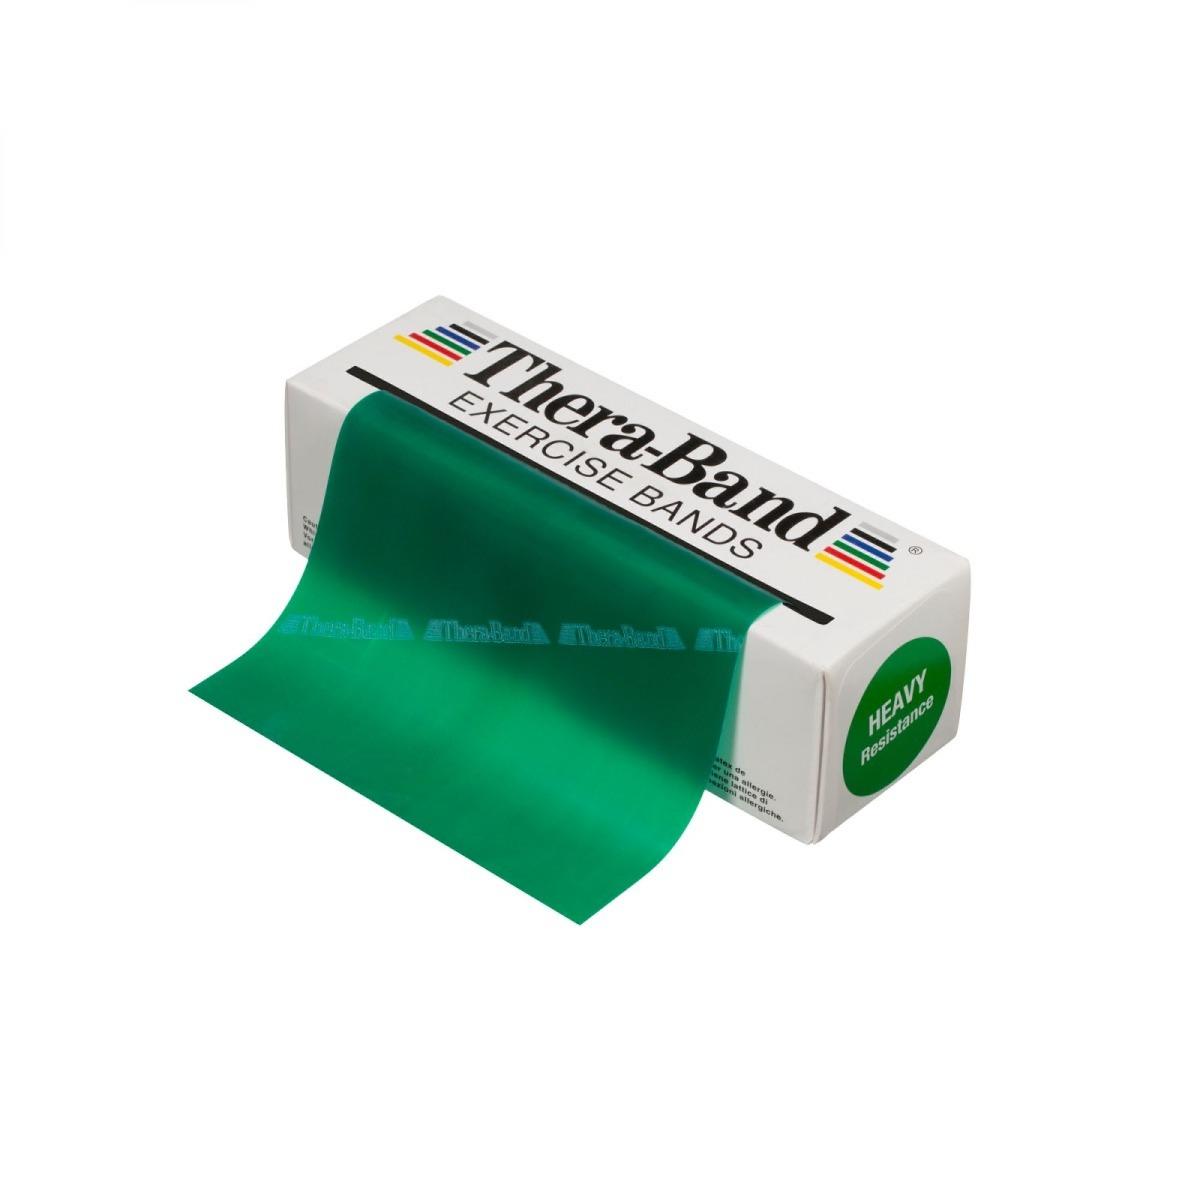 TheraBand 6 yard, Dispenser Box, Level 3, Green, Heavy